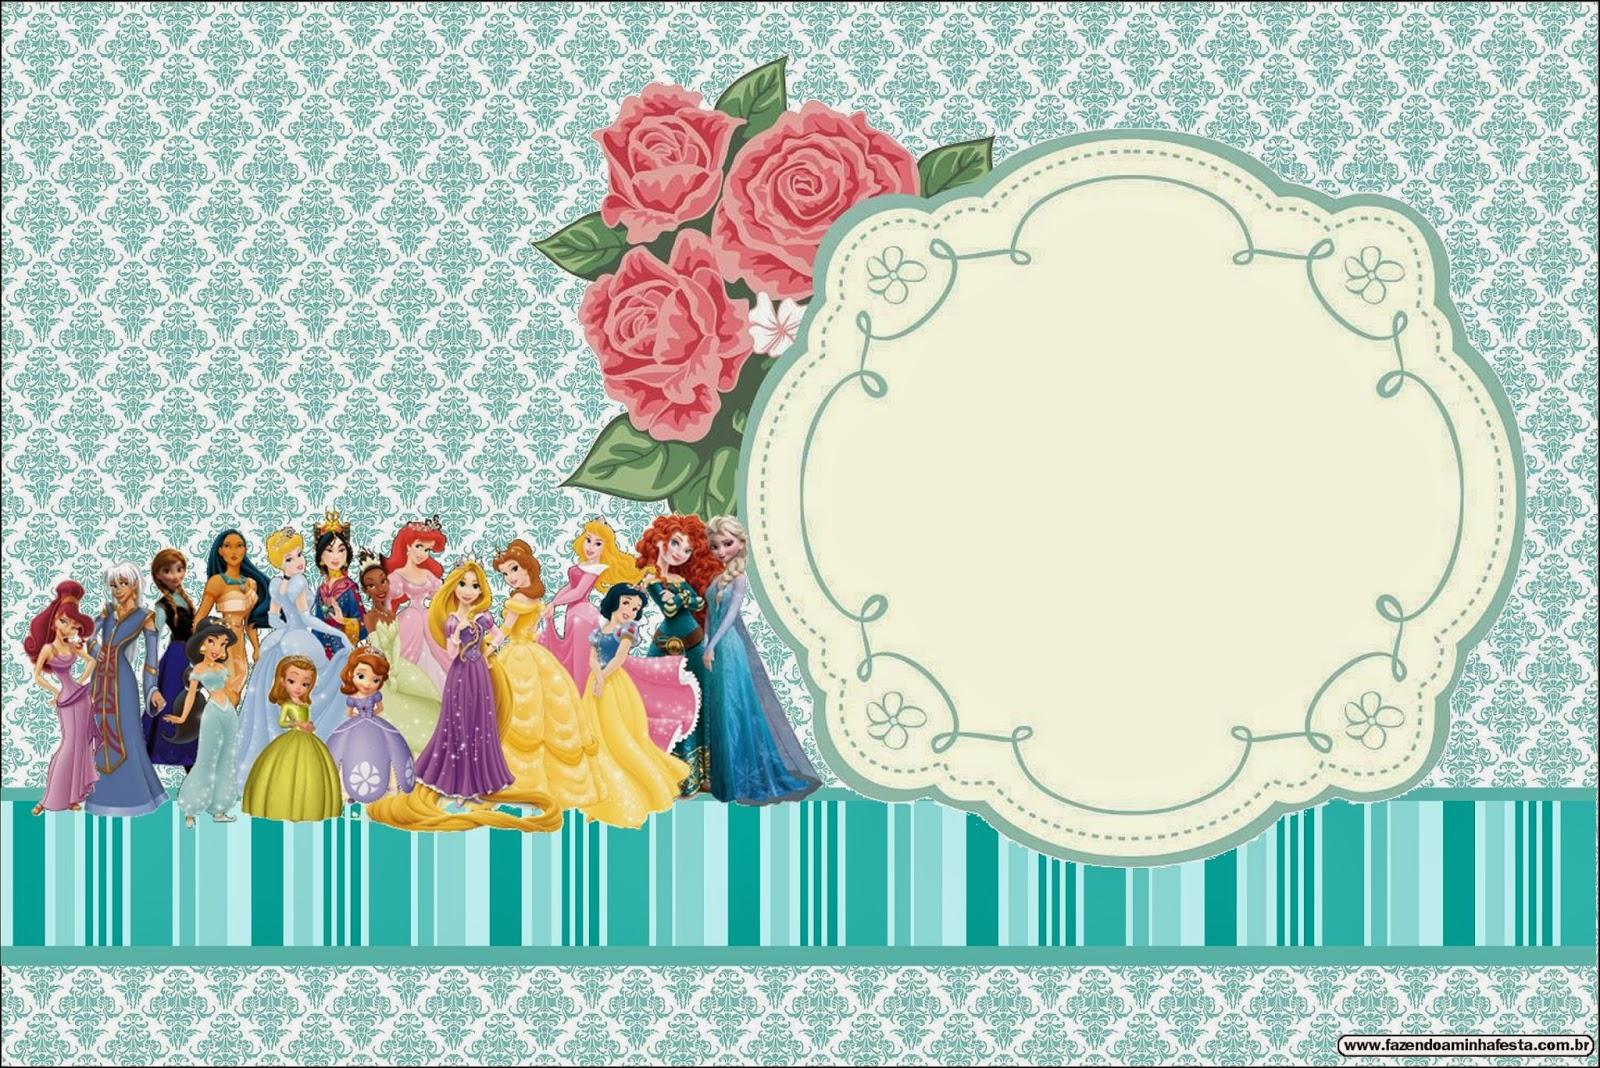 All Disney Princess Free Printable Invitations Oh My Fiesta in